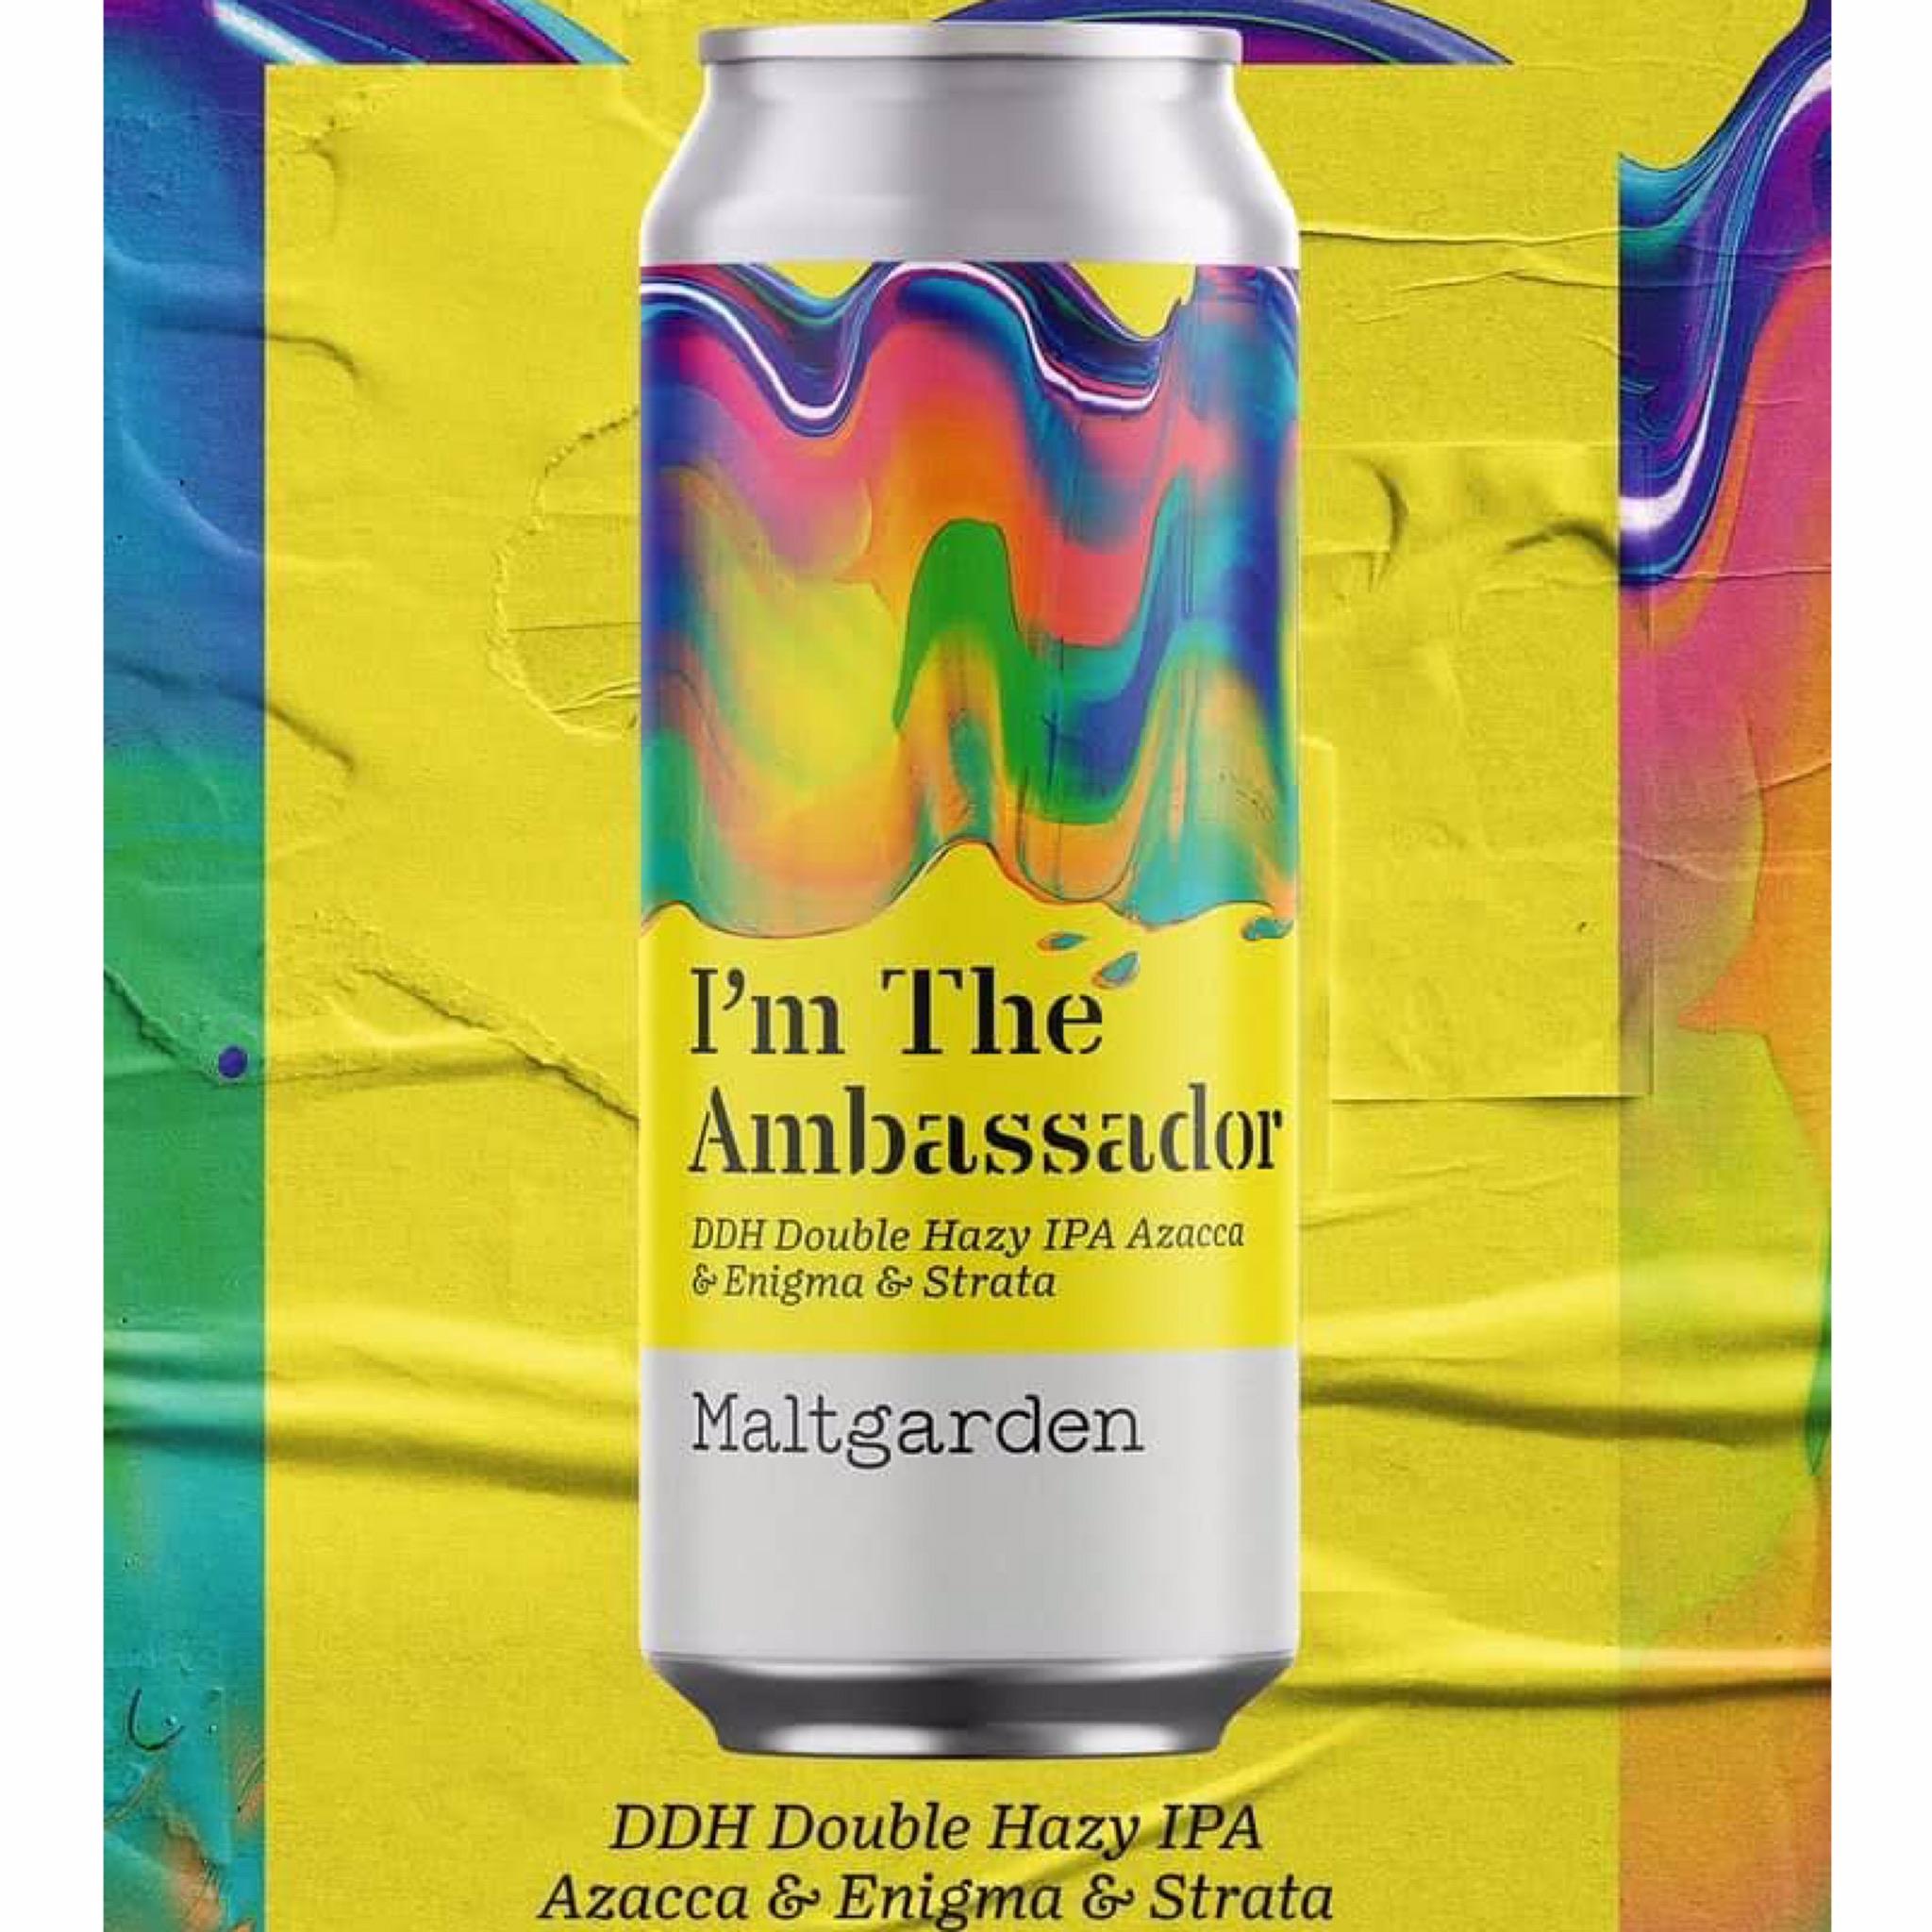 I'm The Ambassador DDH Double Hazy IPA 7.2% 500ml Maltgarden Browar